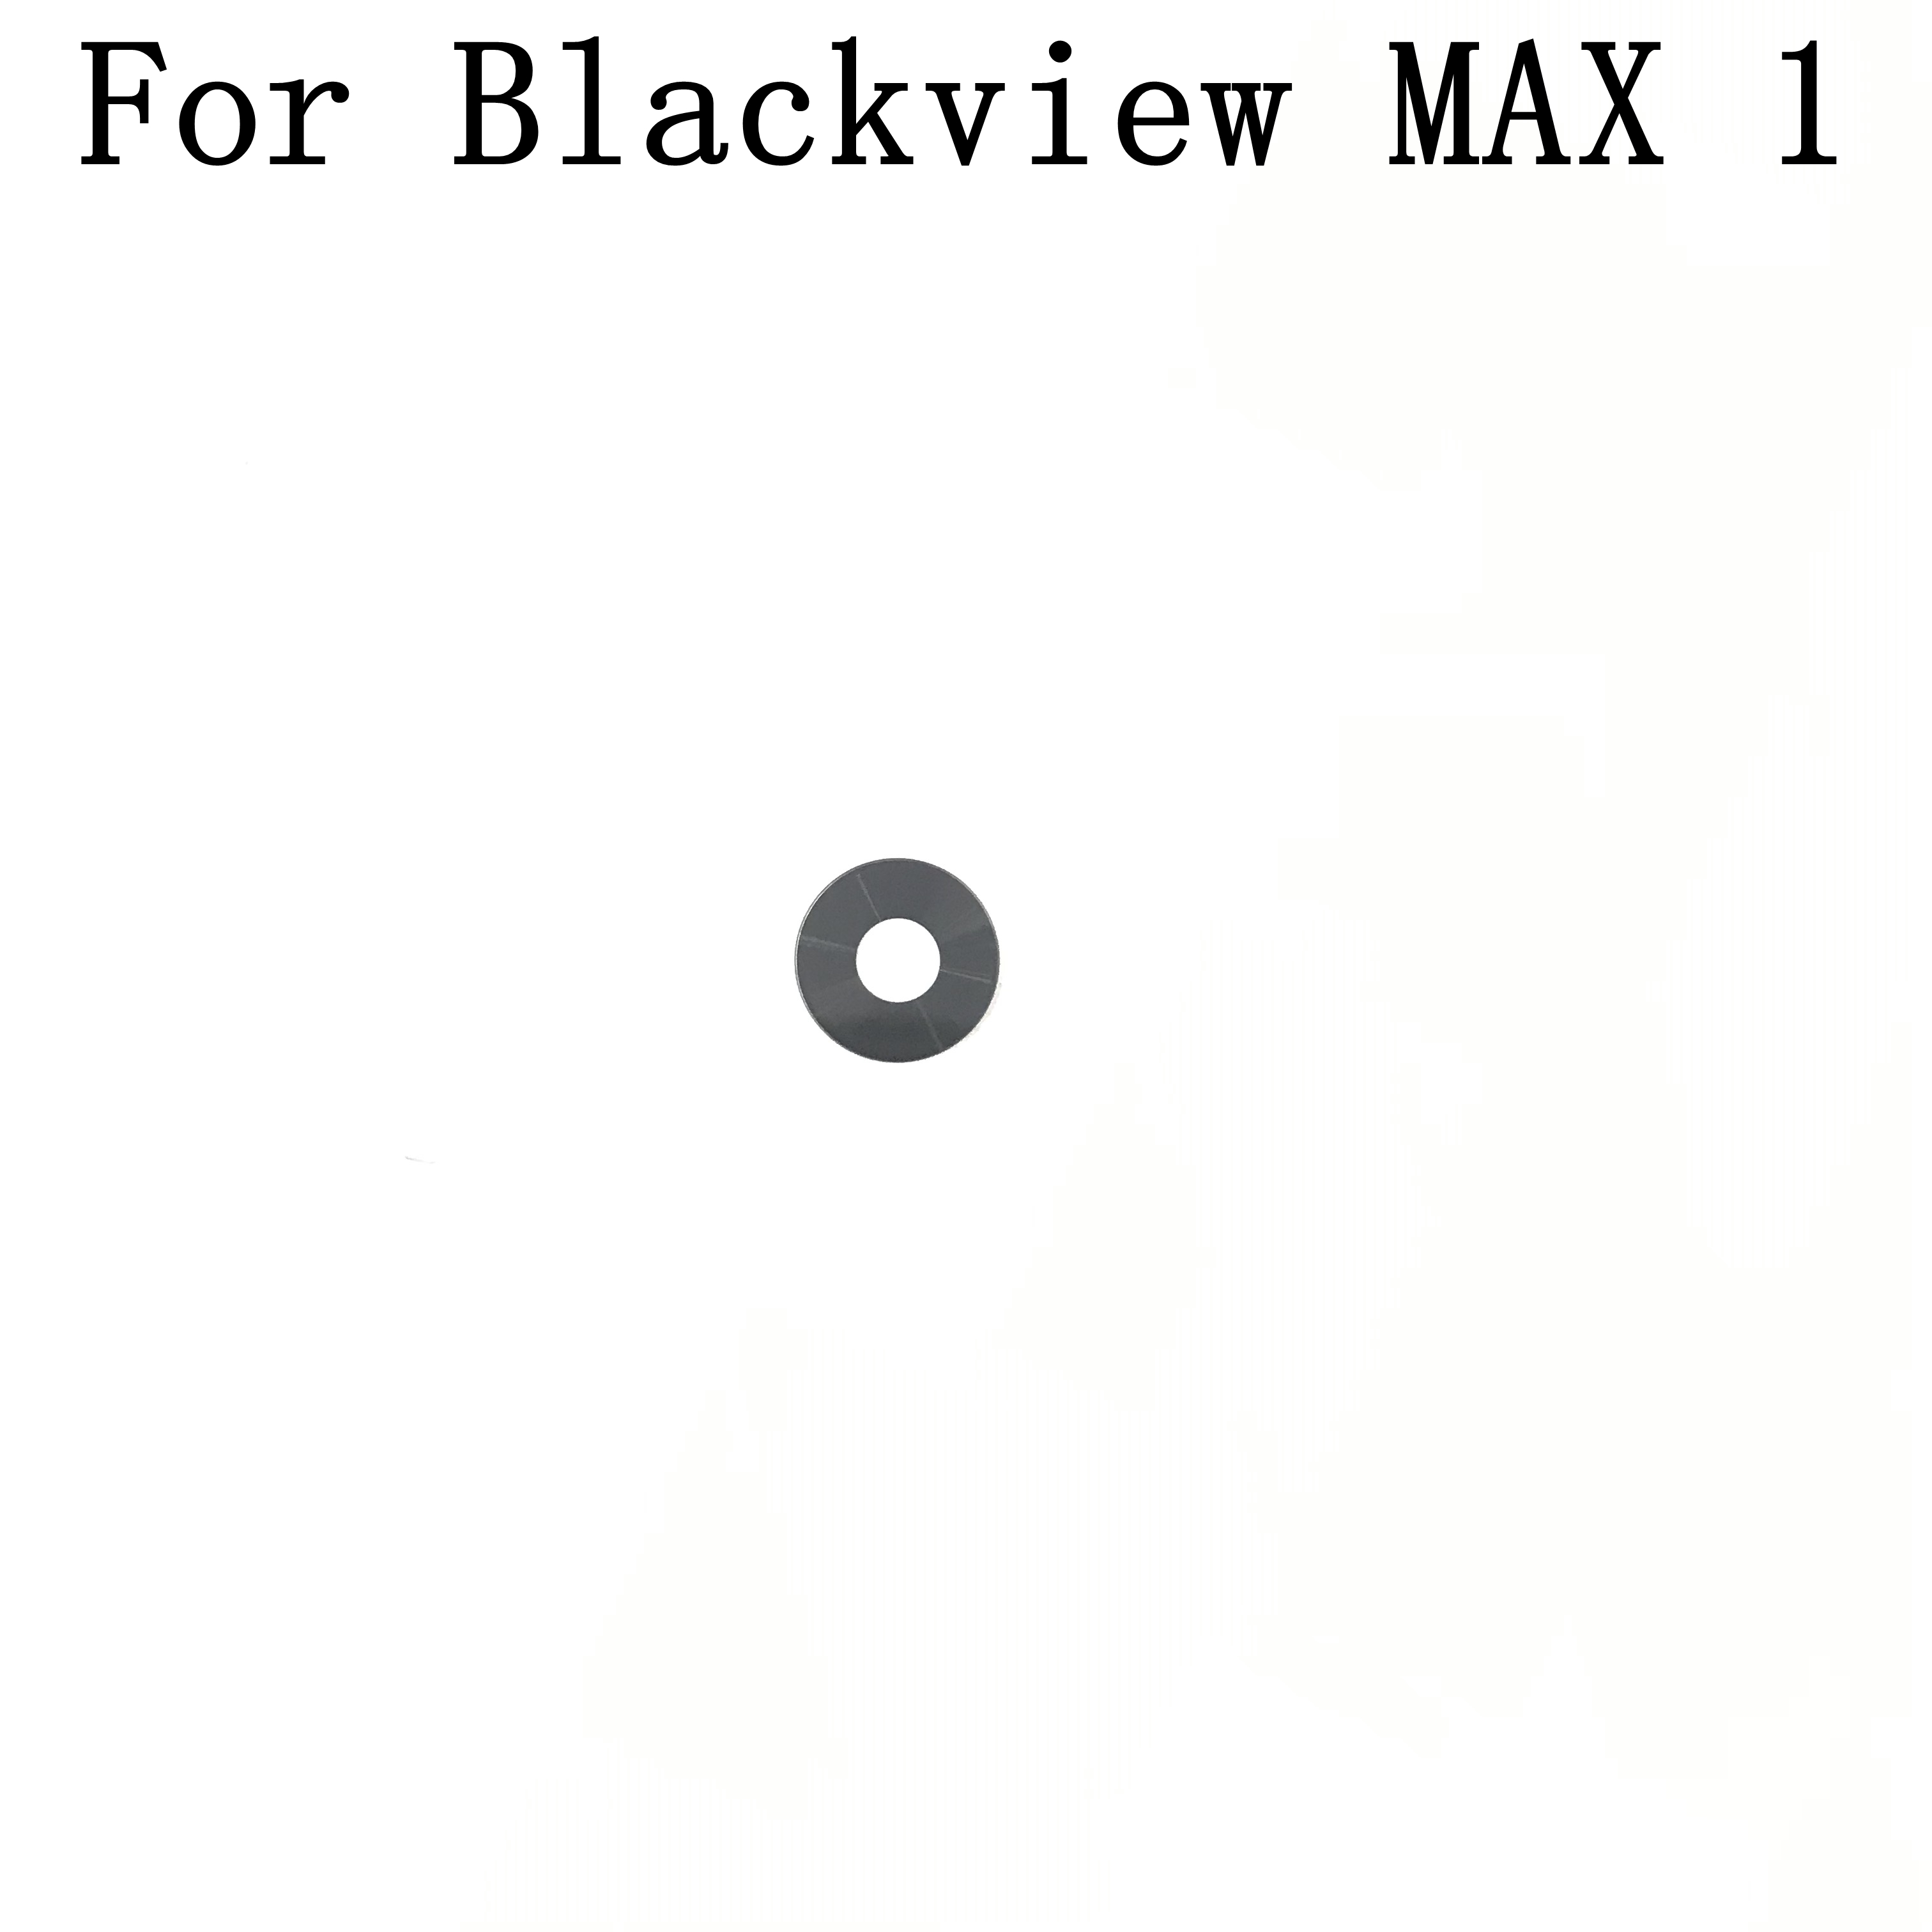 Blackview MAX 1 New Original Camera Glass Lens Rear Cover For Blackview MAX 1 Repair Fixing Part Repla